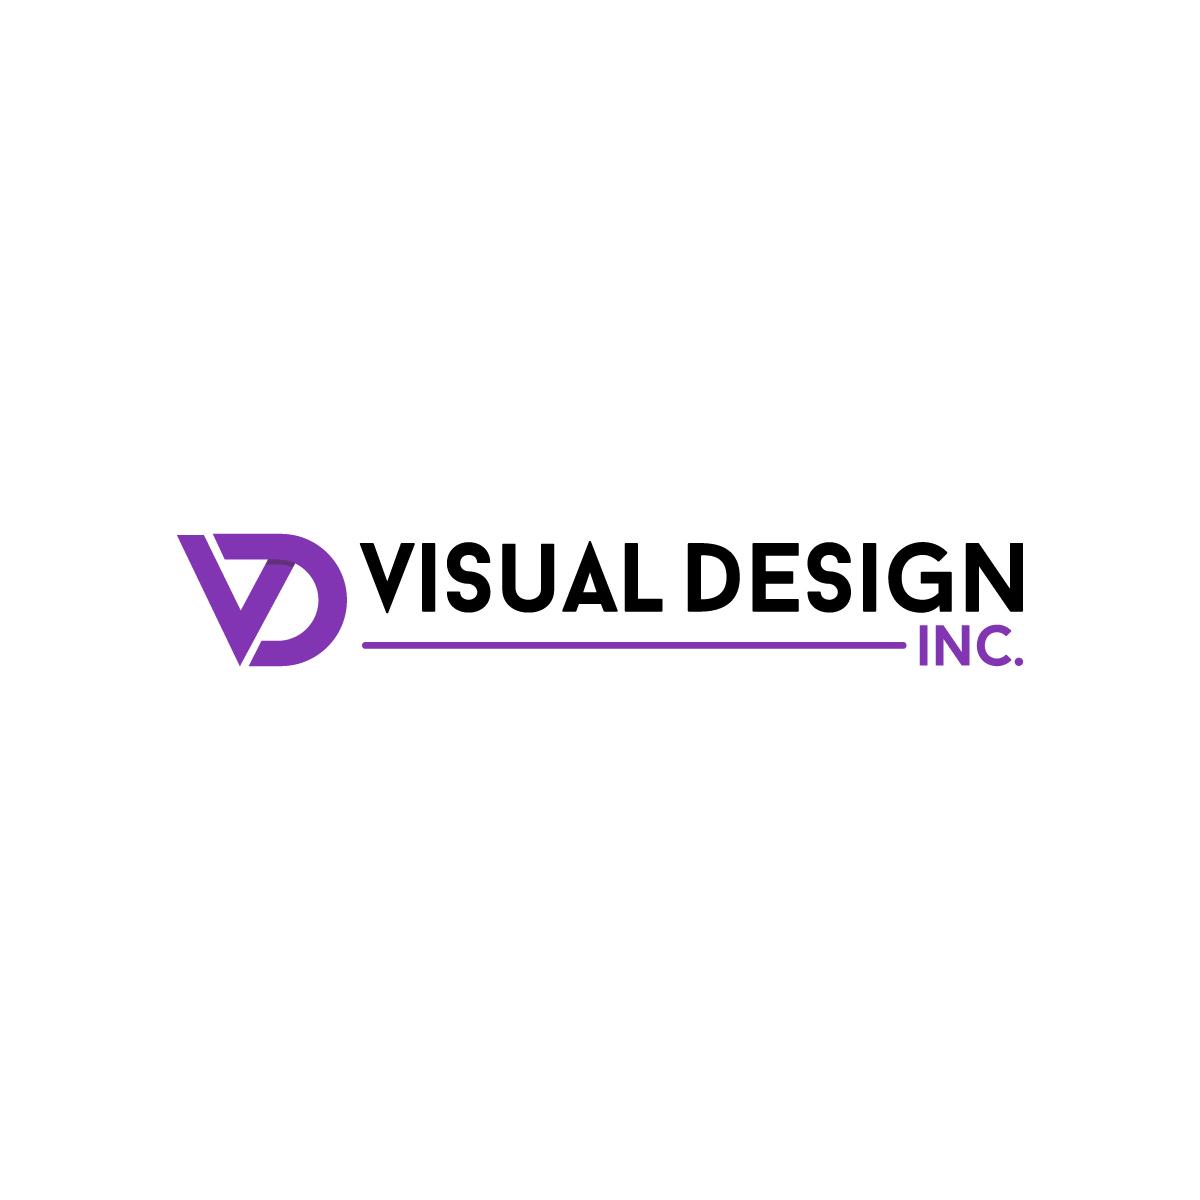 Visual Design Inc. Logo